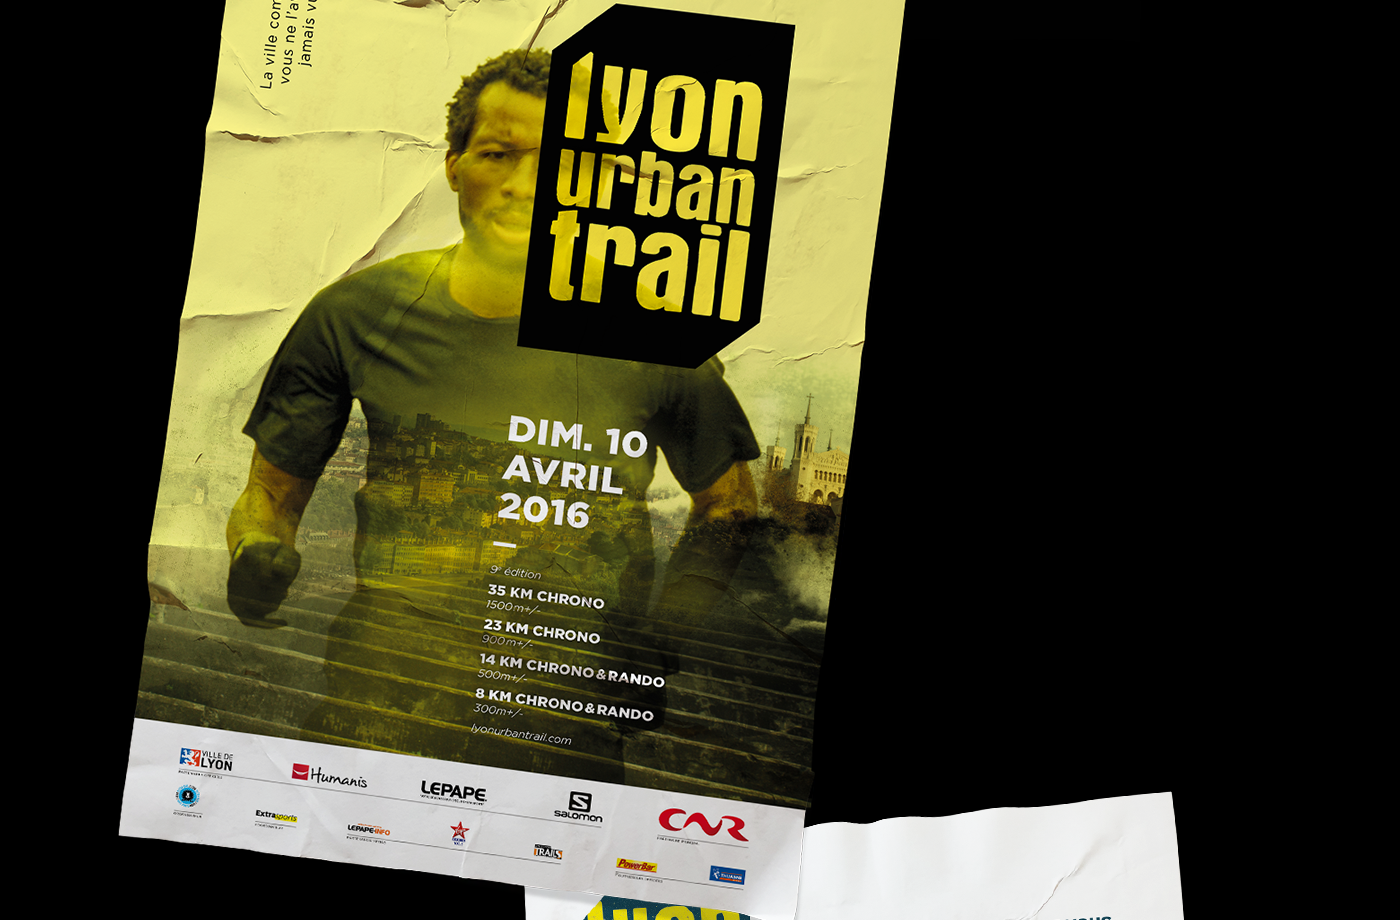 trail run poster lyon sport lights city trailers runner saint-etienne